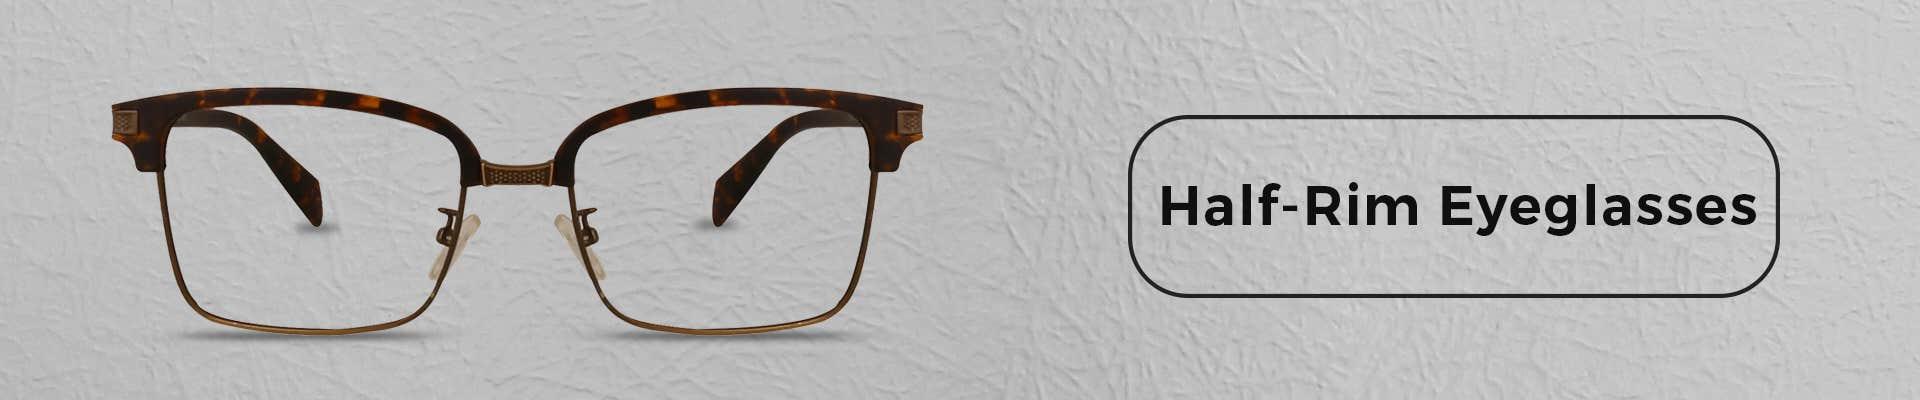 Half Rim Eyeglasses